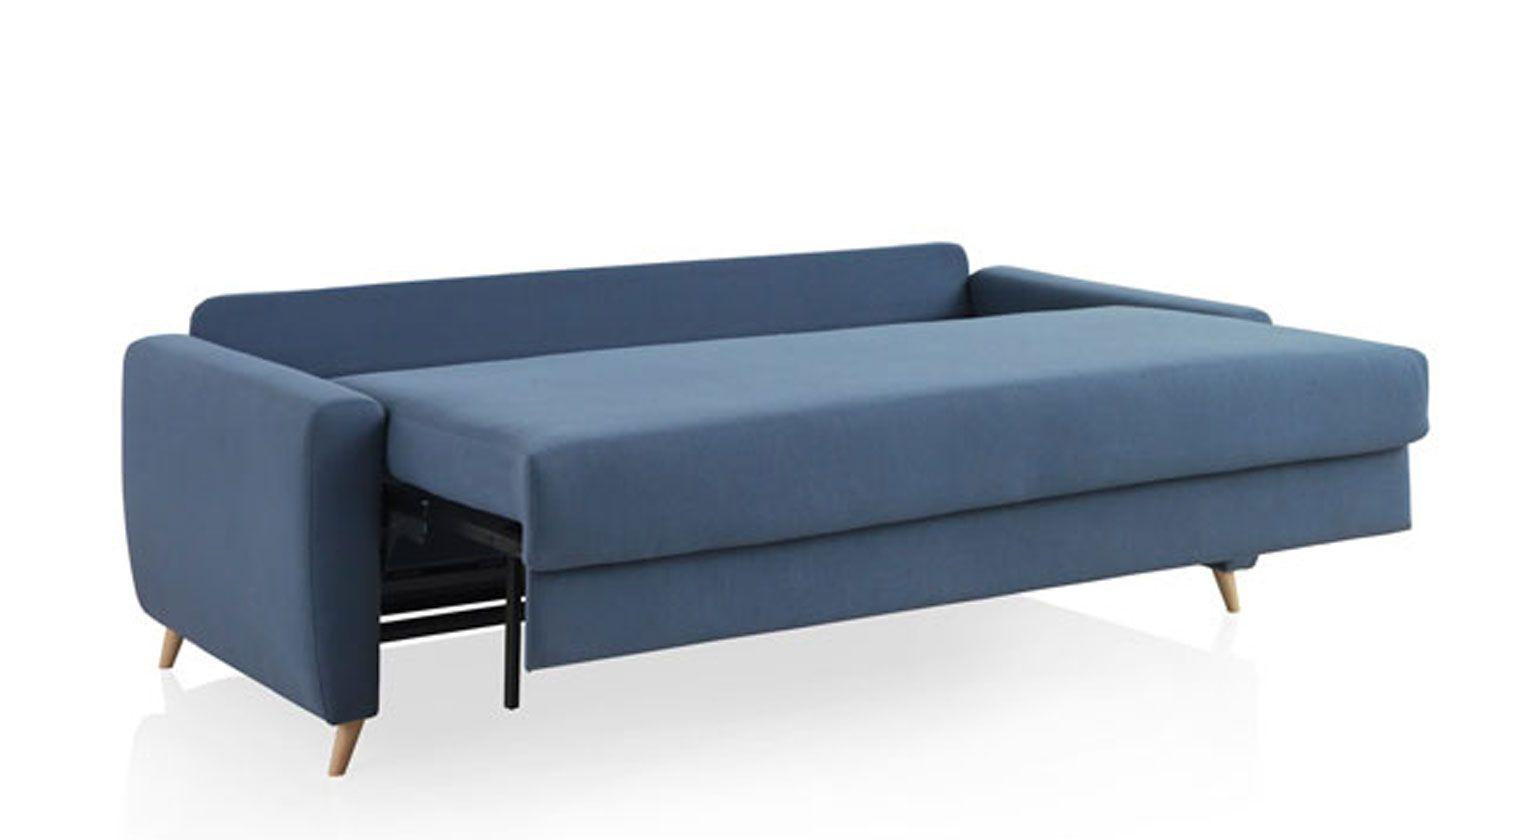 Comprar sof cama nice 1 plaza cama de 80x190 cm buzo for Sofa cama 1 plaza barato